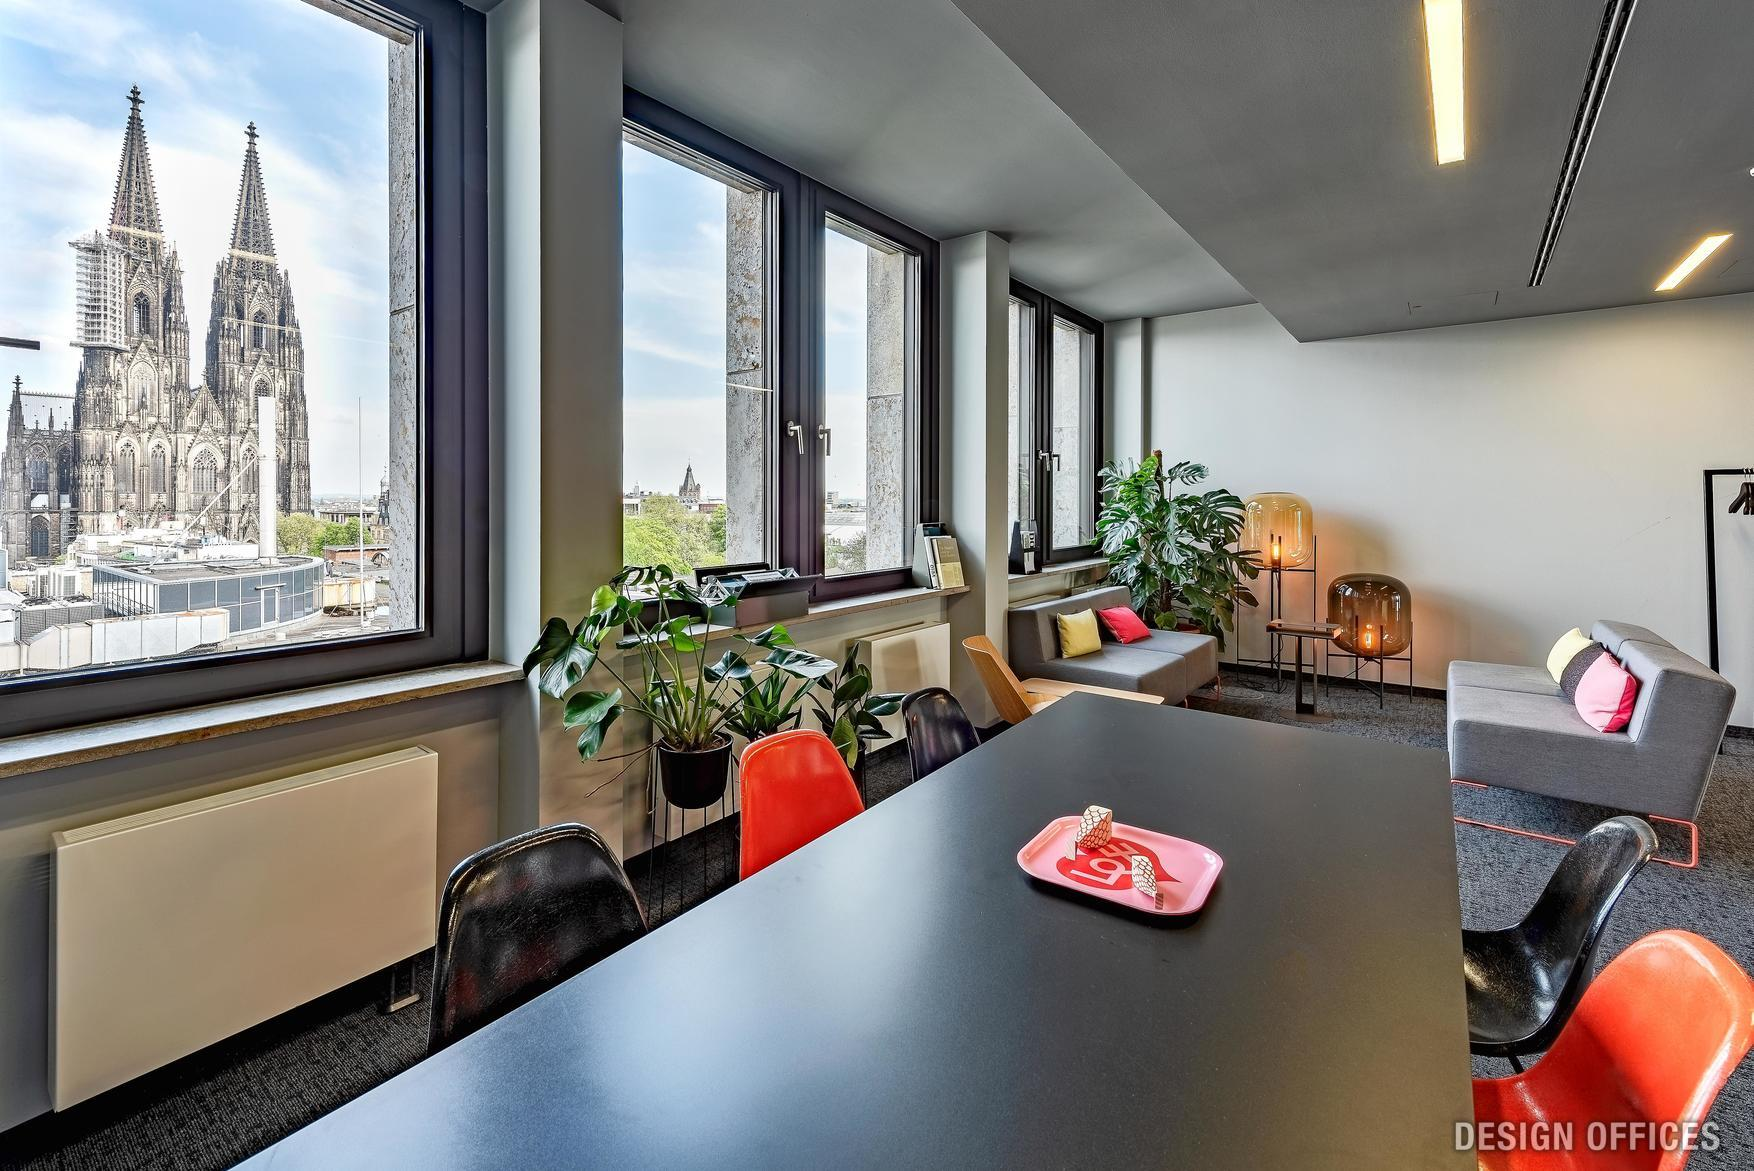 3. Neuer BuyBay Standort Köln